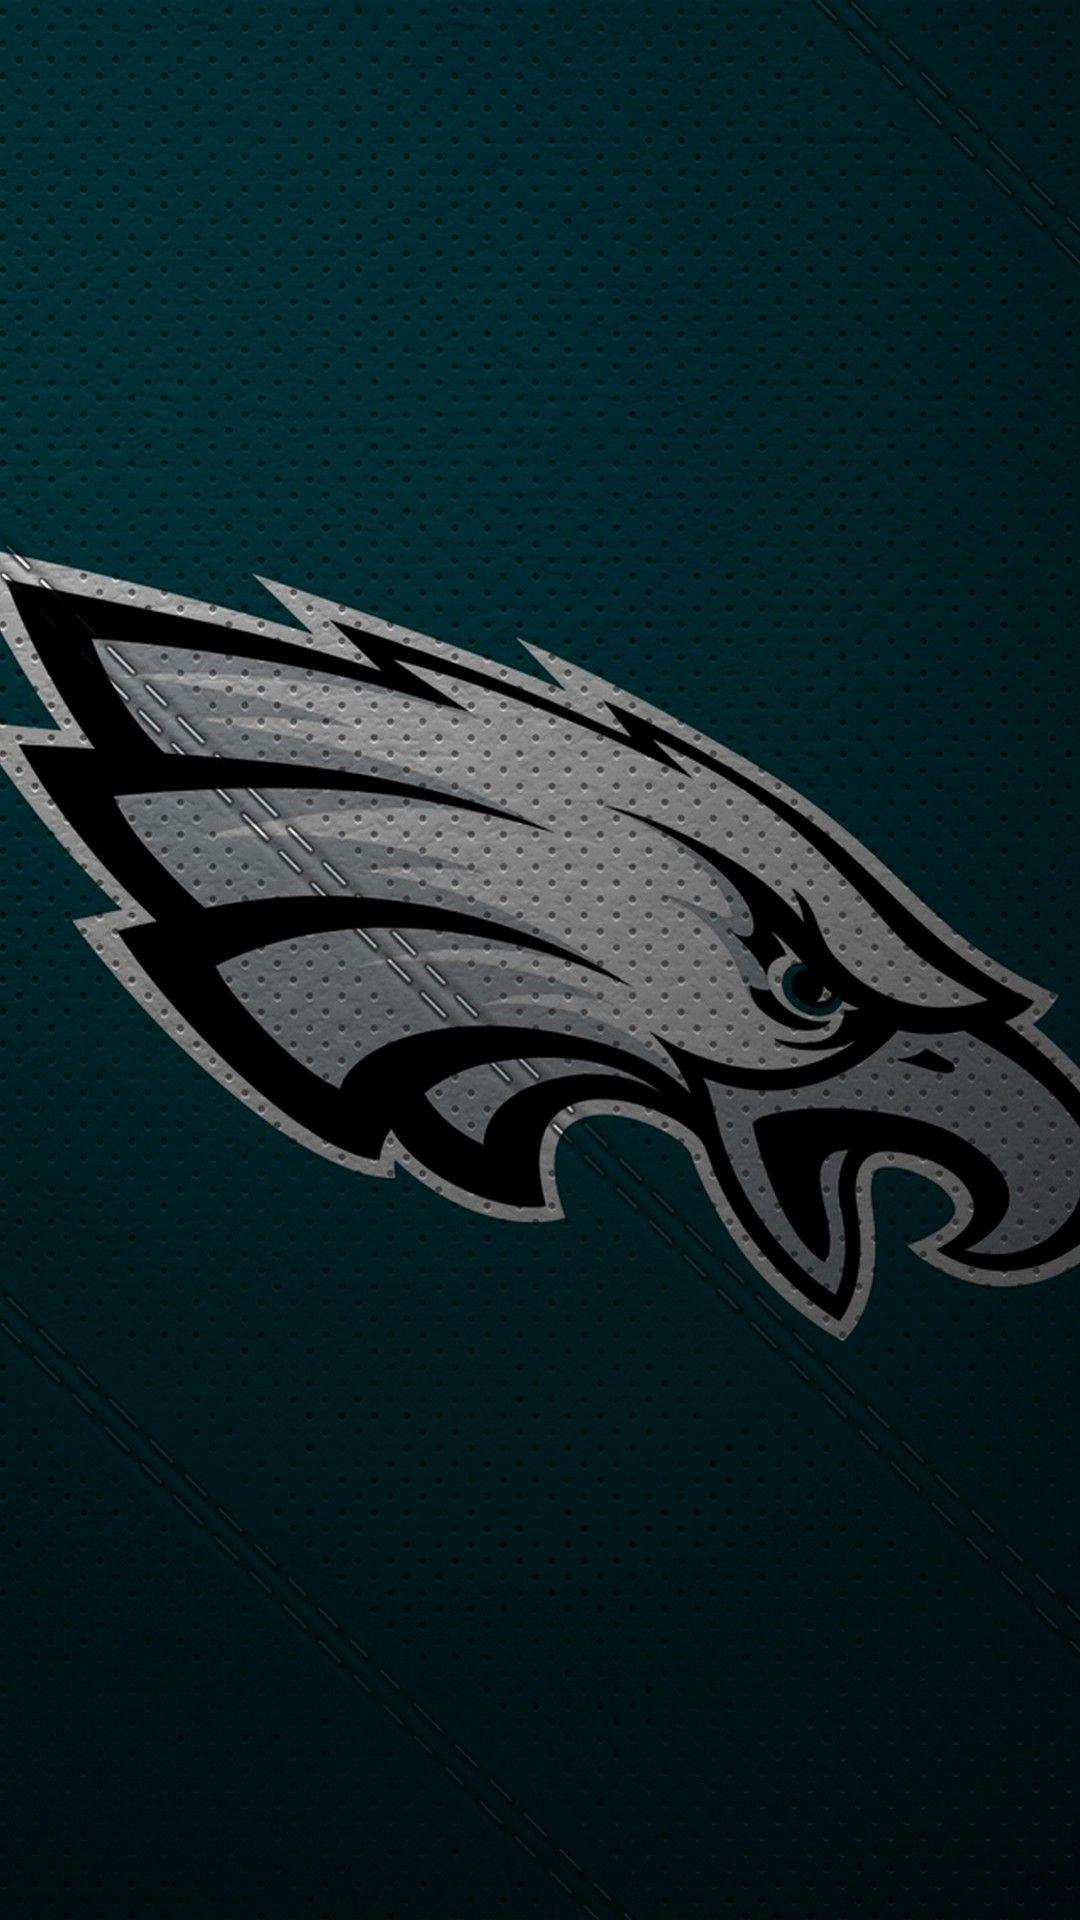 Eagles iPhone 8 Wallpaper Philadelphia eagles wallpaper